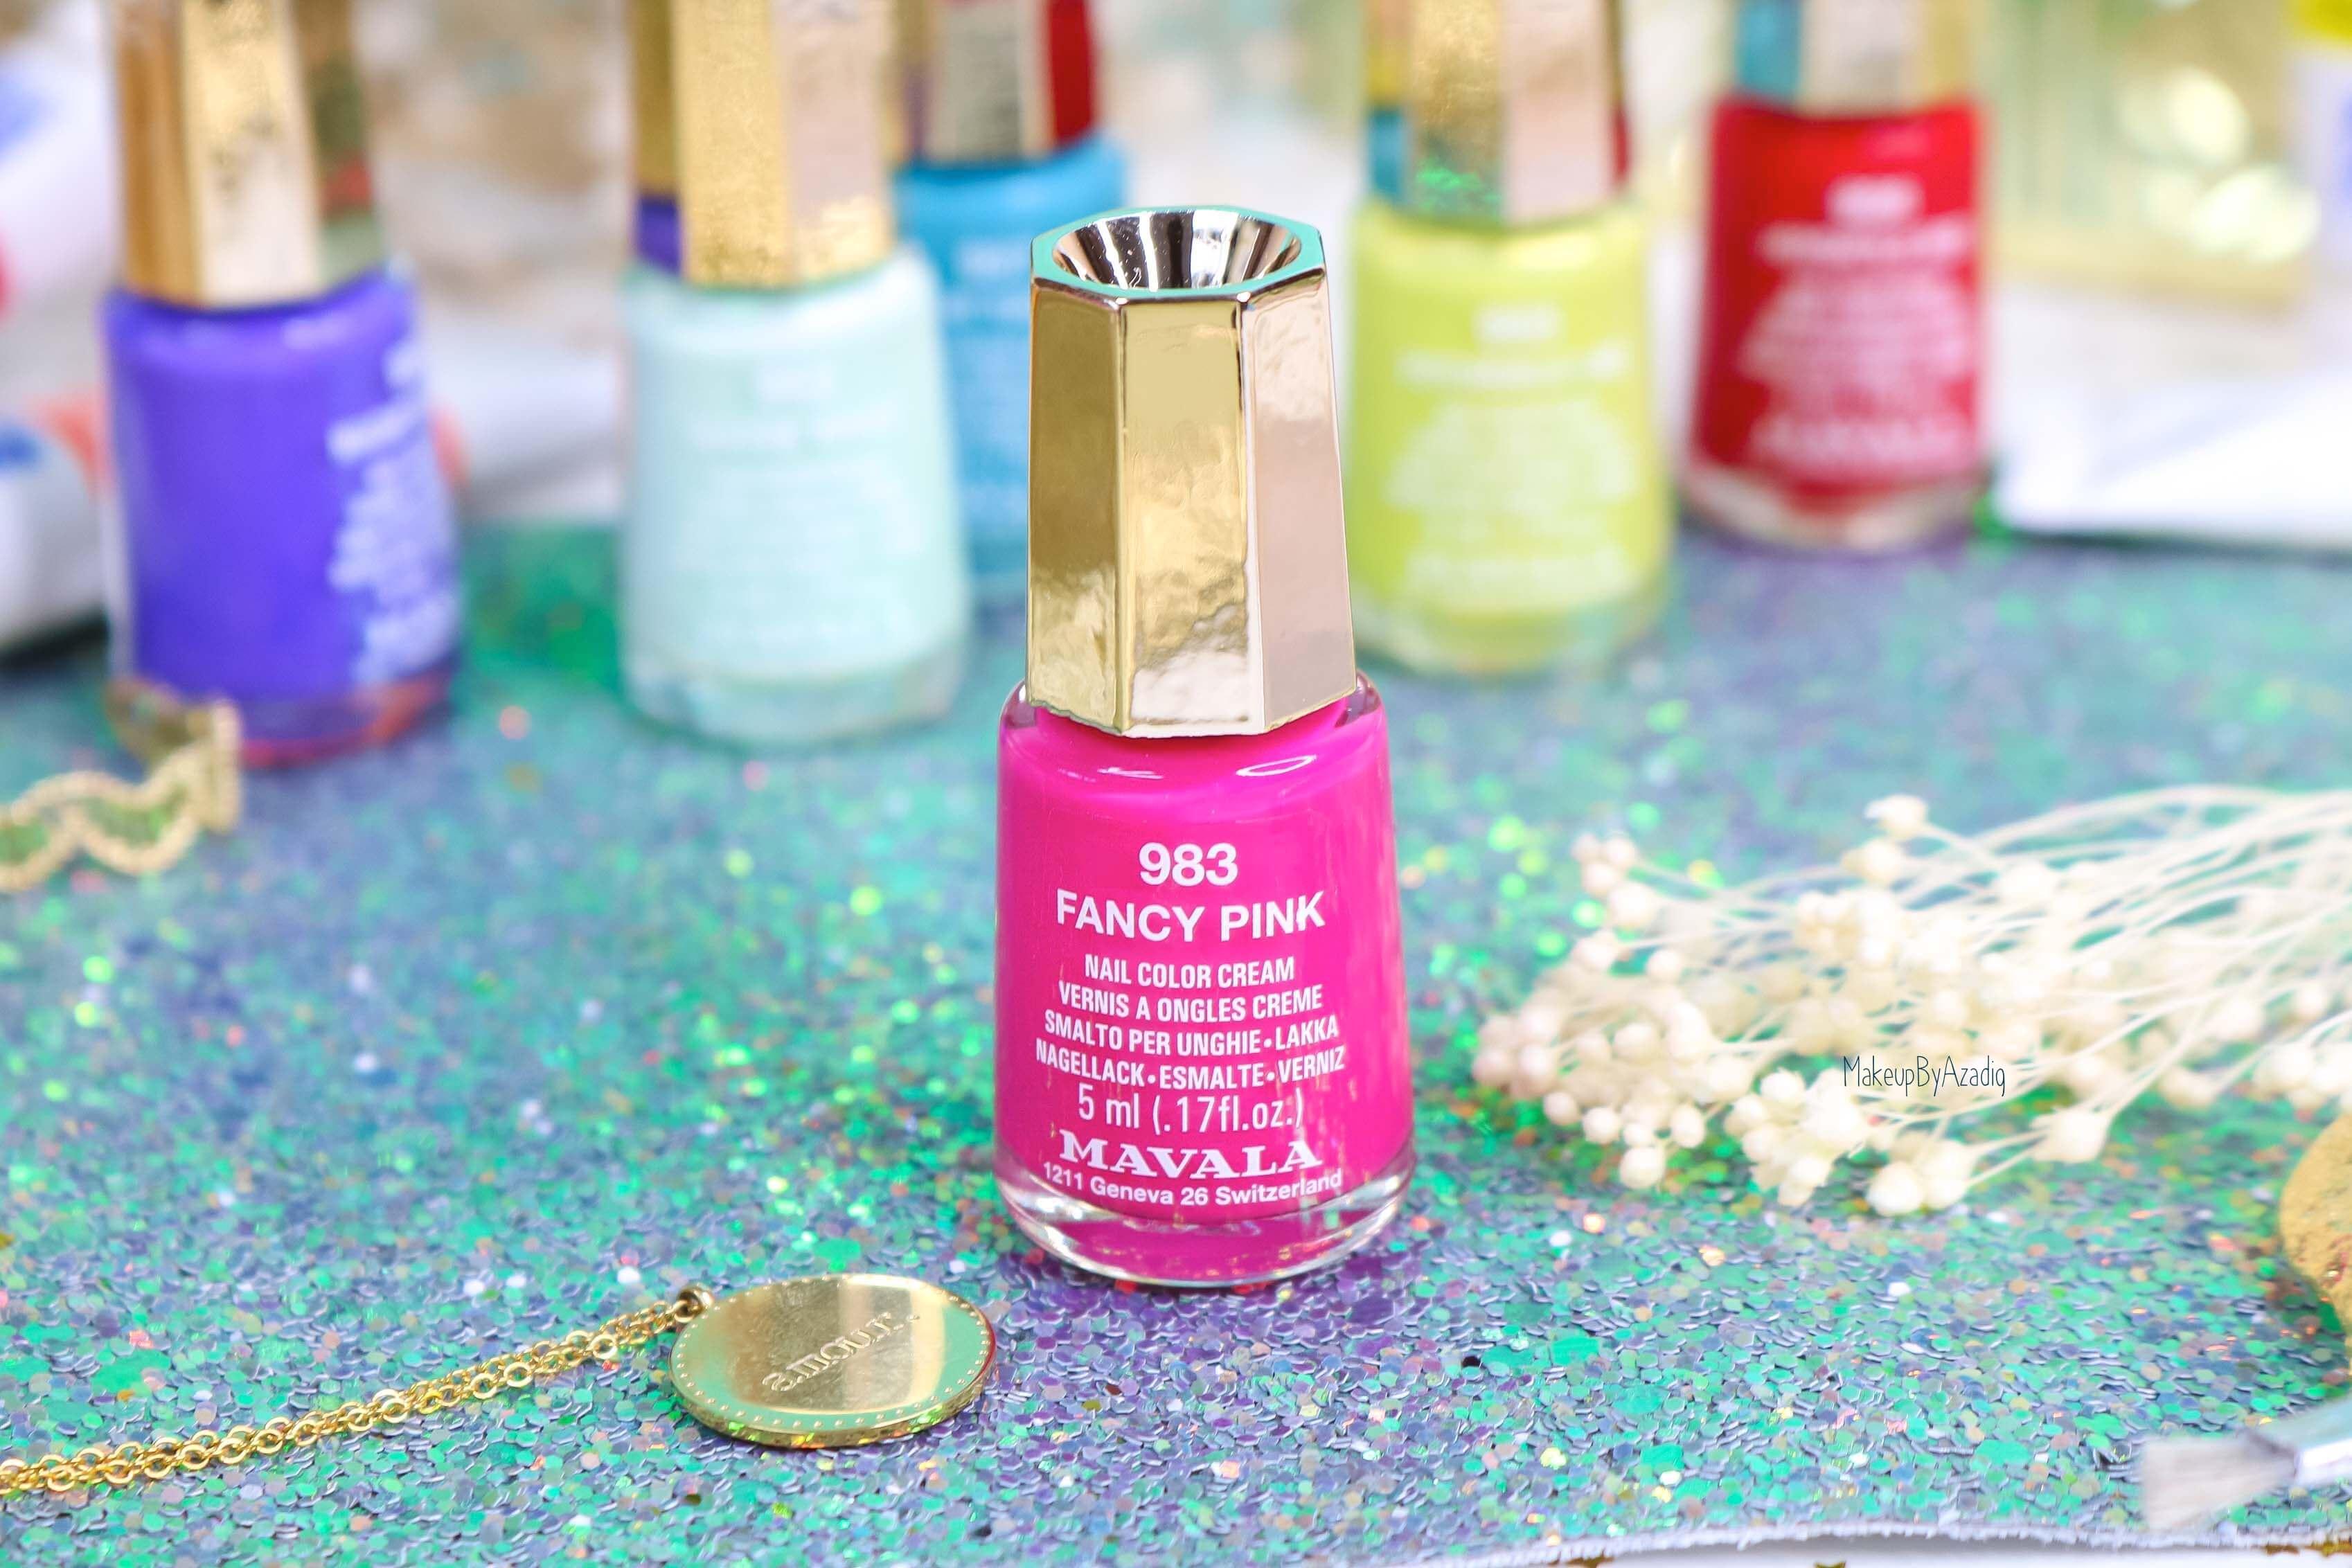 revue-collection-vernis-mavala-nails-dash-splash-ete-2019-bleu-orange-makeupbyazadig-swatch-avis-prix-fancy-pink